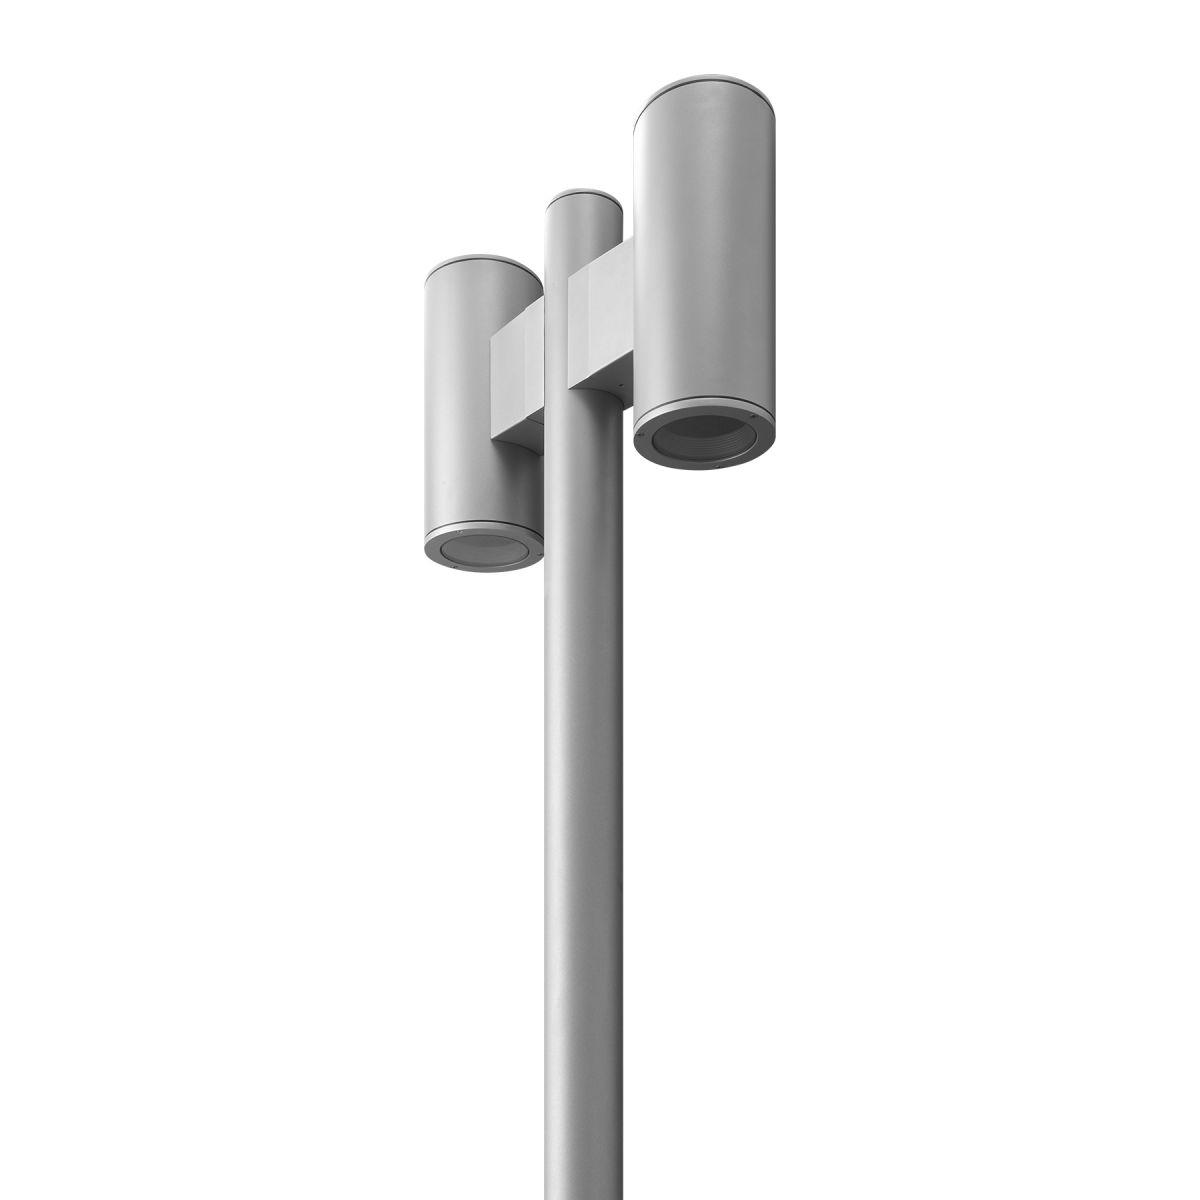 Maxi TUBE - Pole Light / Double Sided